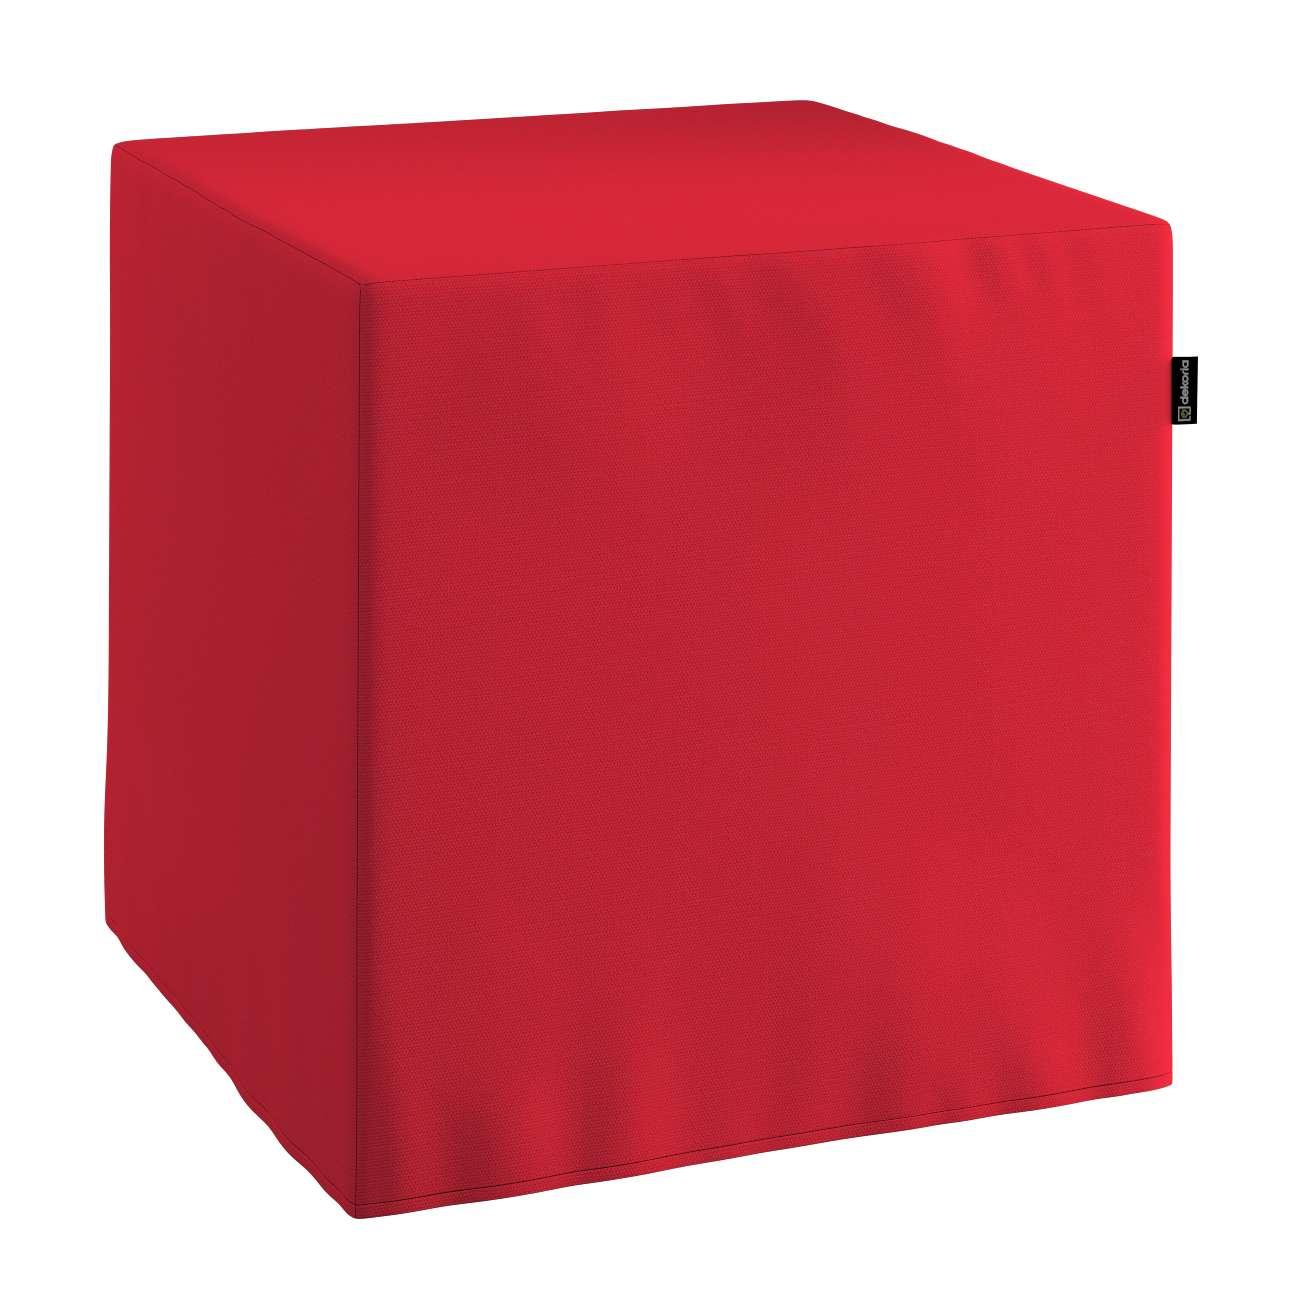 Sedák kostka - pevná 40x40x40 40 x 40 x 40 cm v kolekci Cotton Panama, látka: 702-04